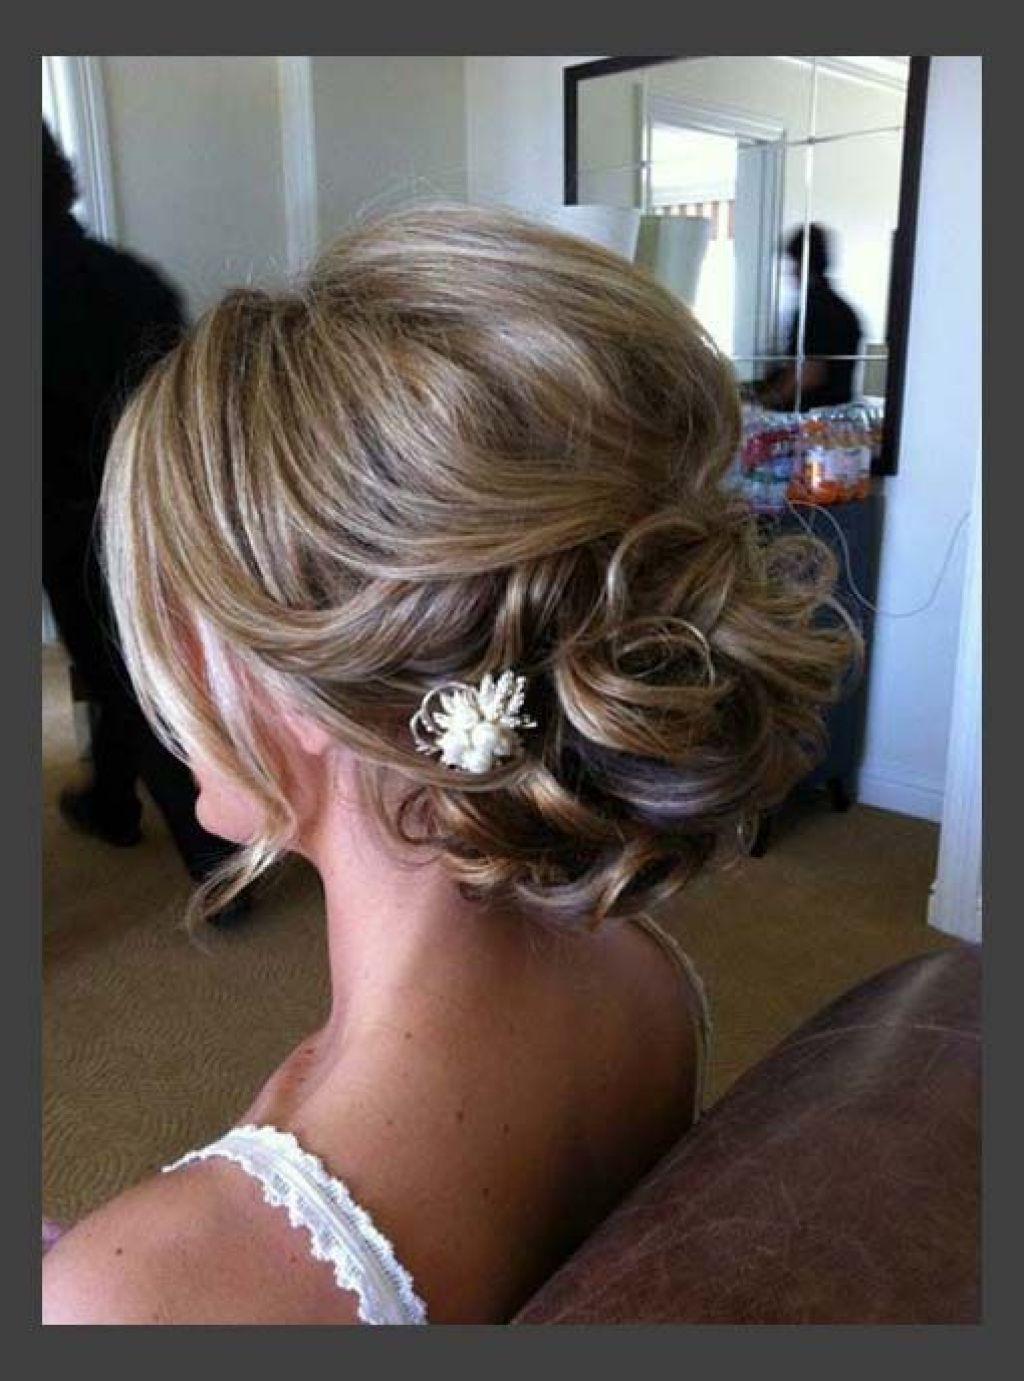 Pretty Updos For Medium Length Hair Ideas Medium Haircuts Short Hair Updo Short Hairstyles Fine Mother Of The Bride Hair